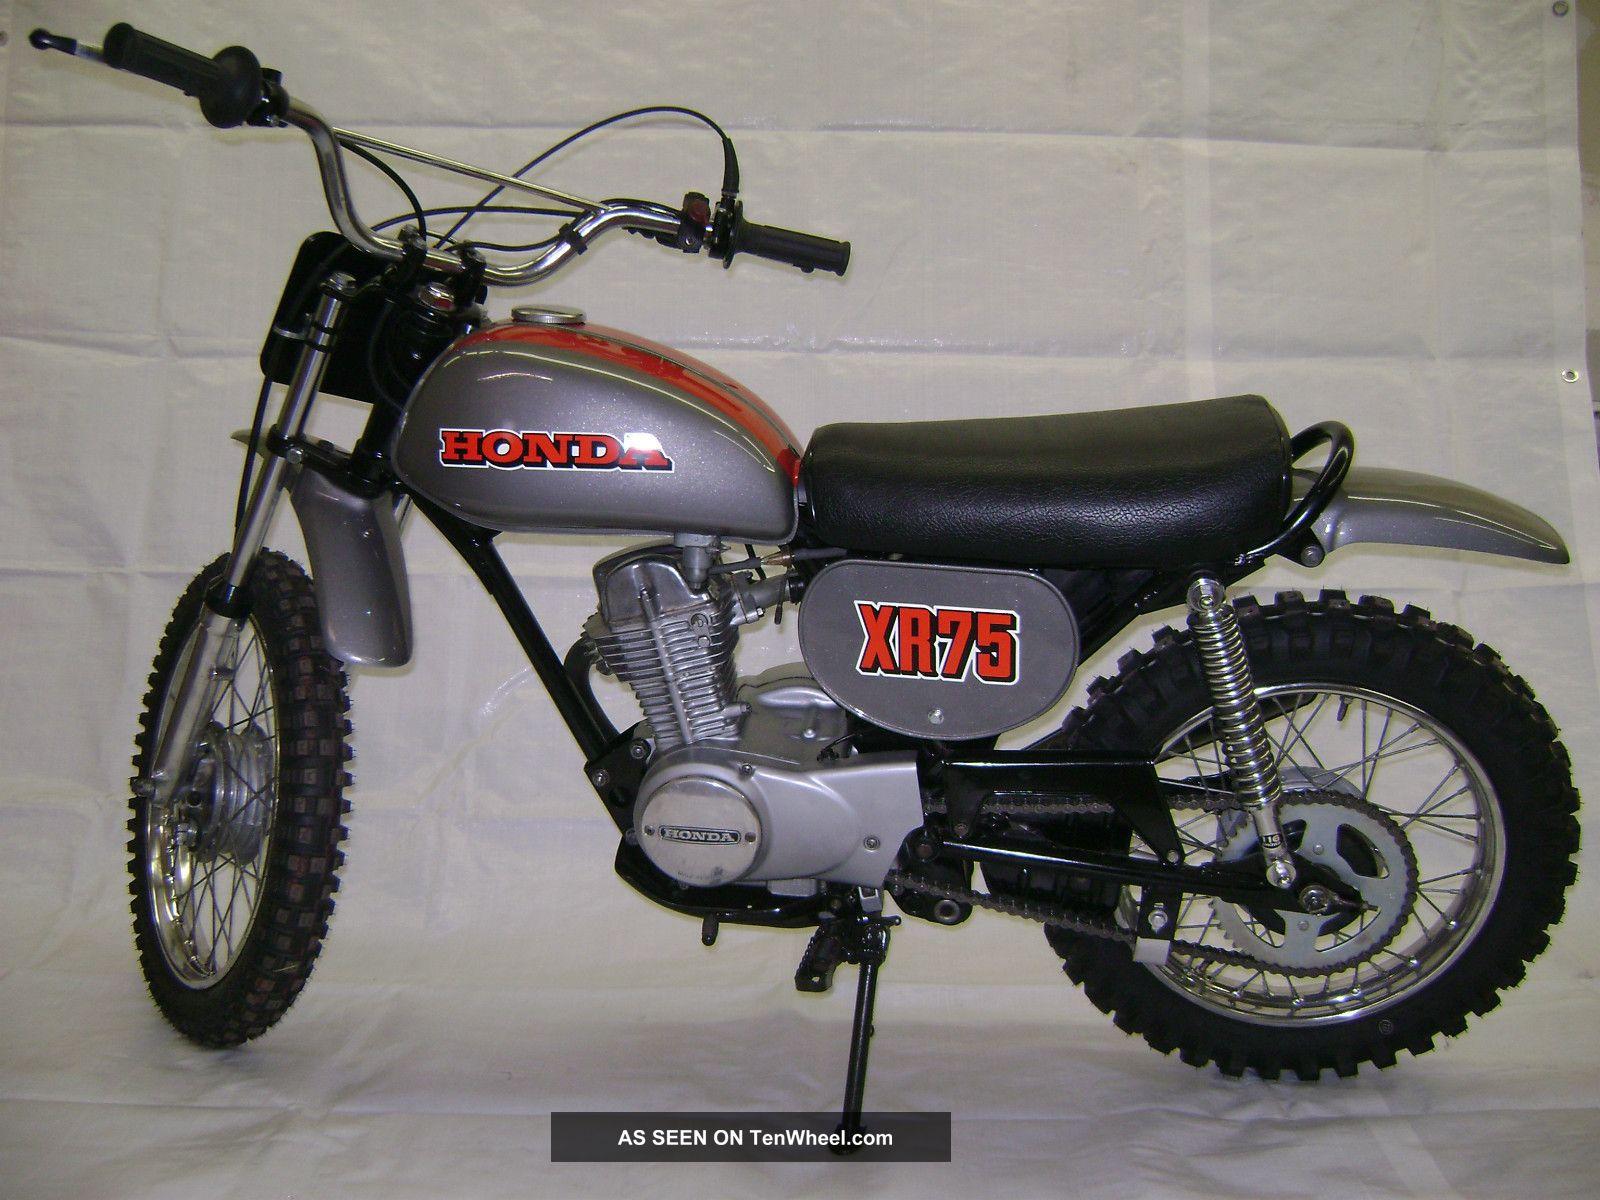 73 1973 Honda Xr75 Motorcycle Xr - 75 Xr 75 XR photo